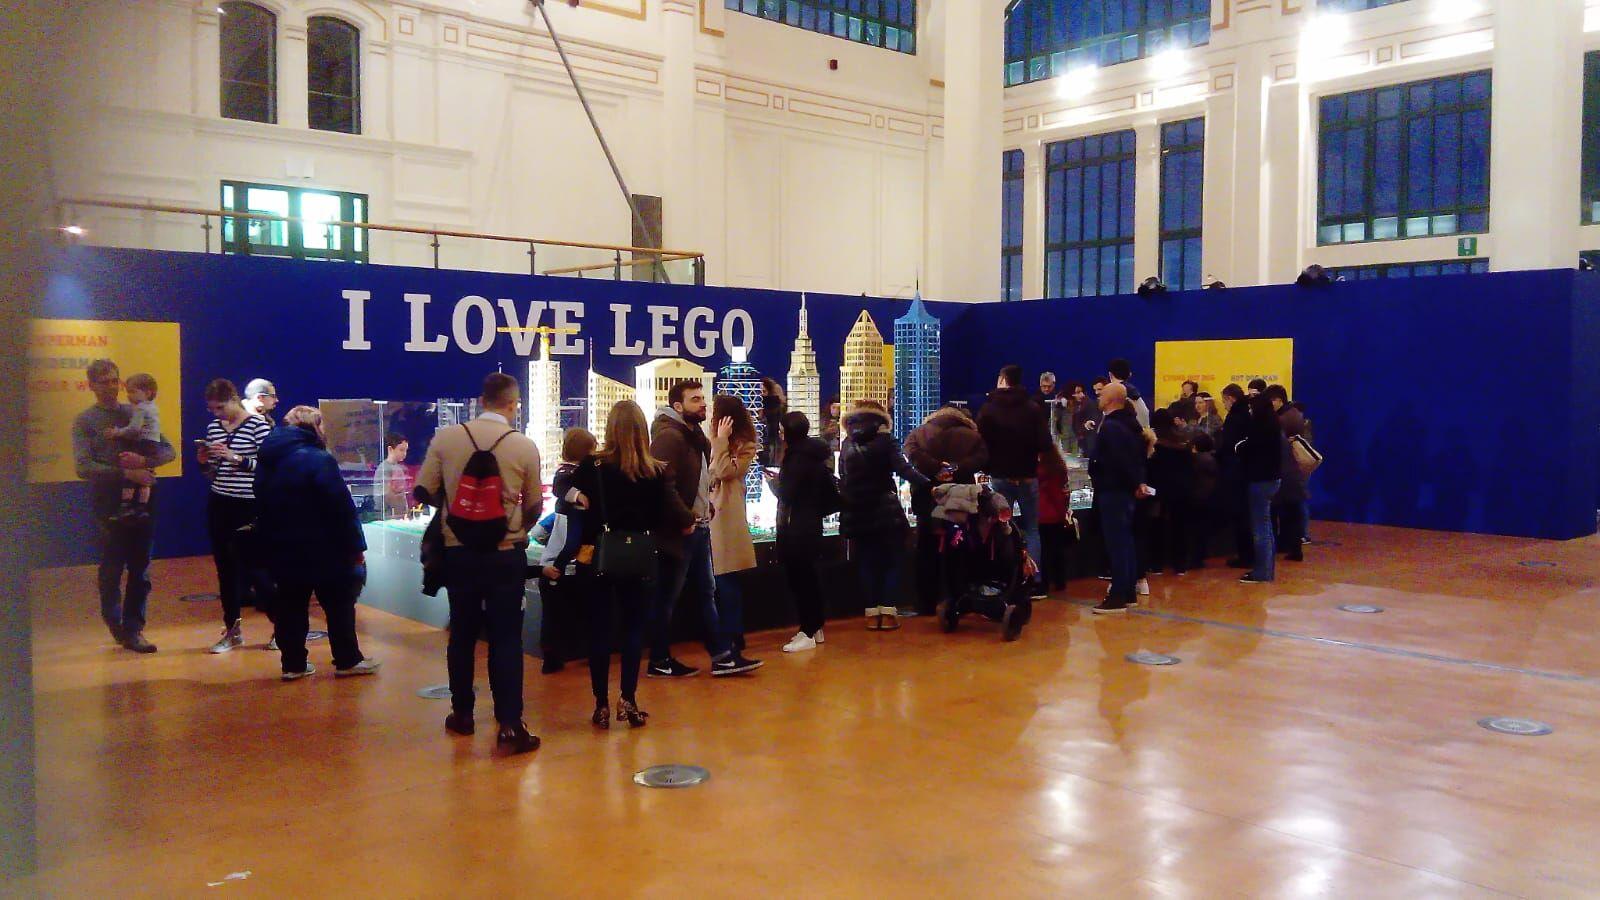 I LOVE LEGO Trieste